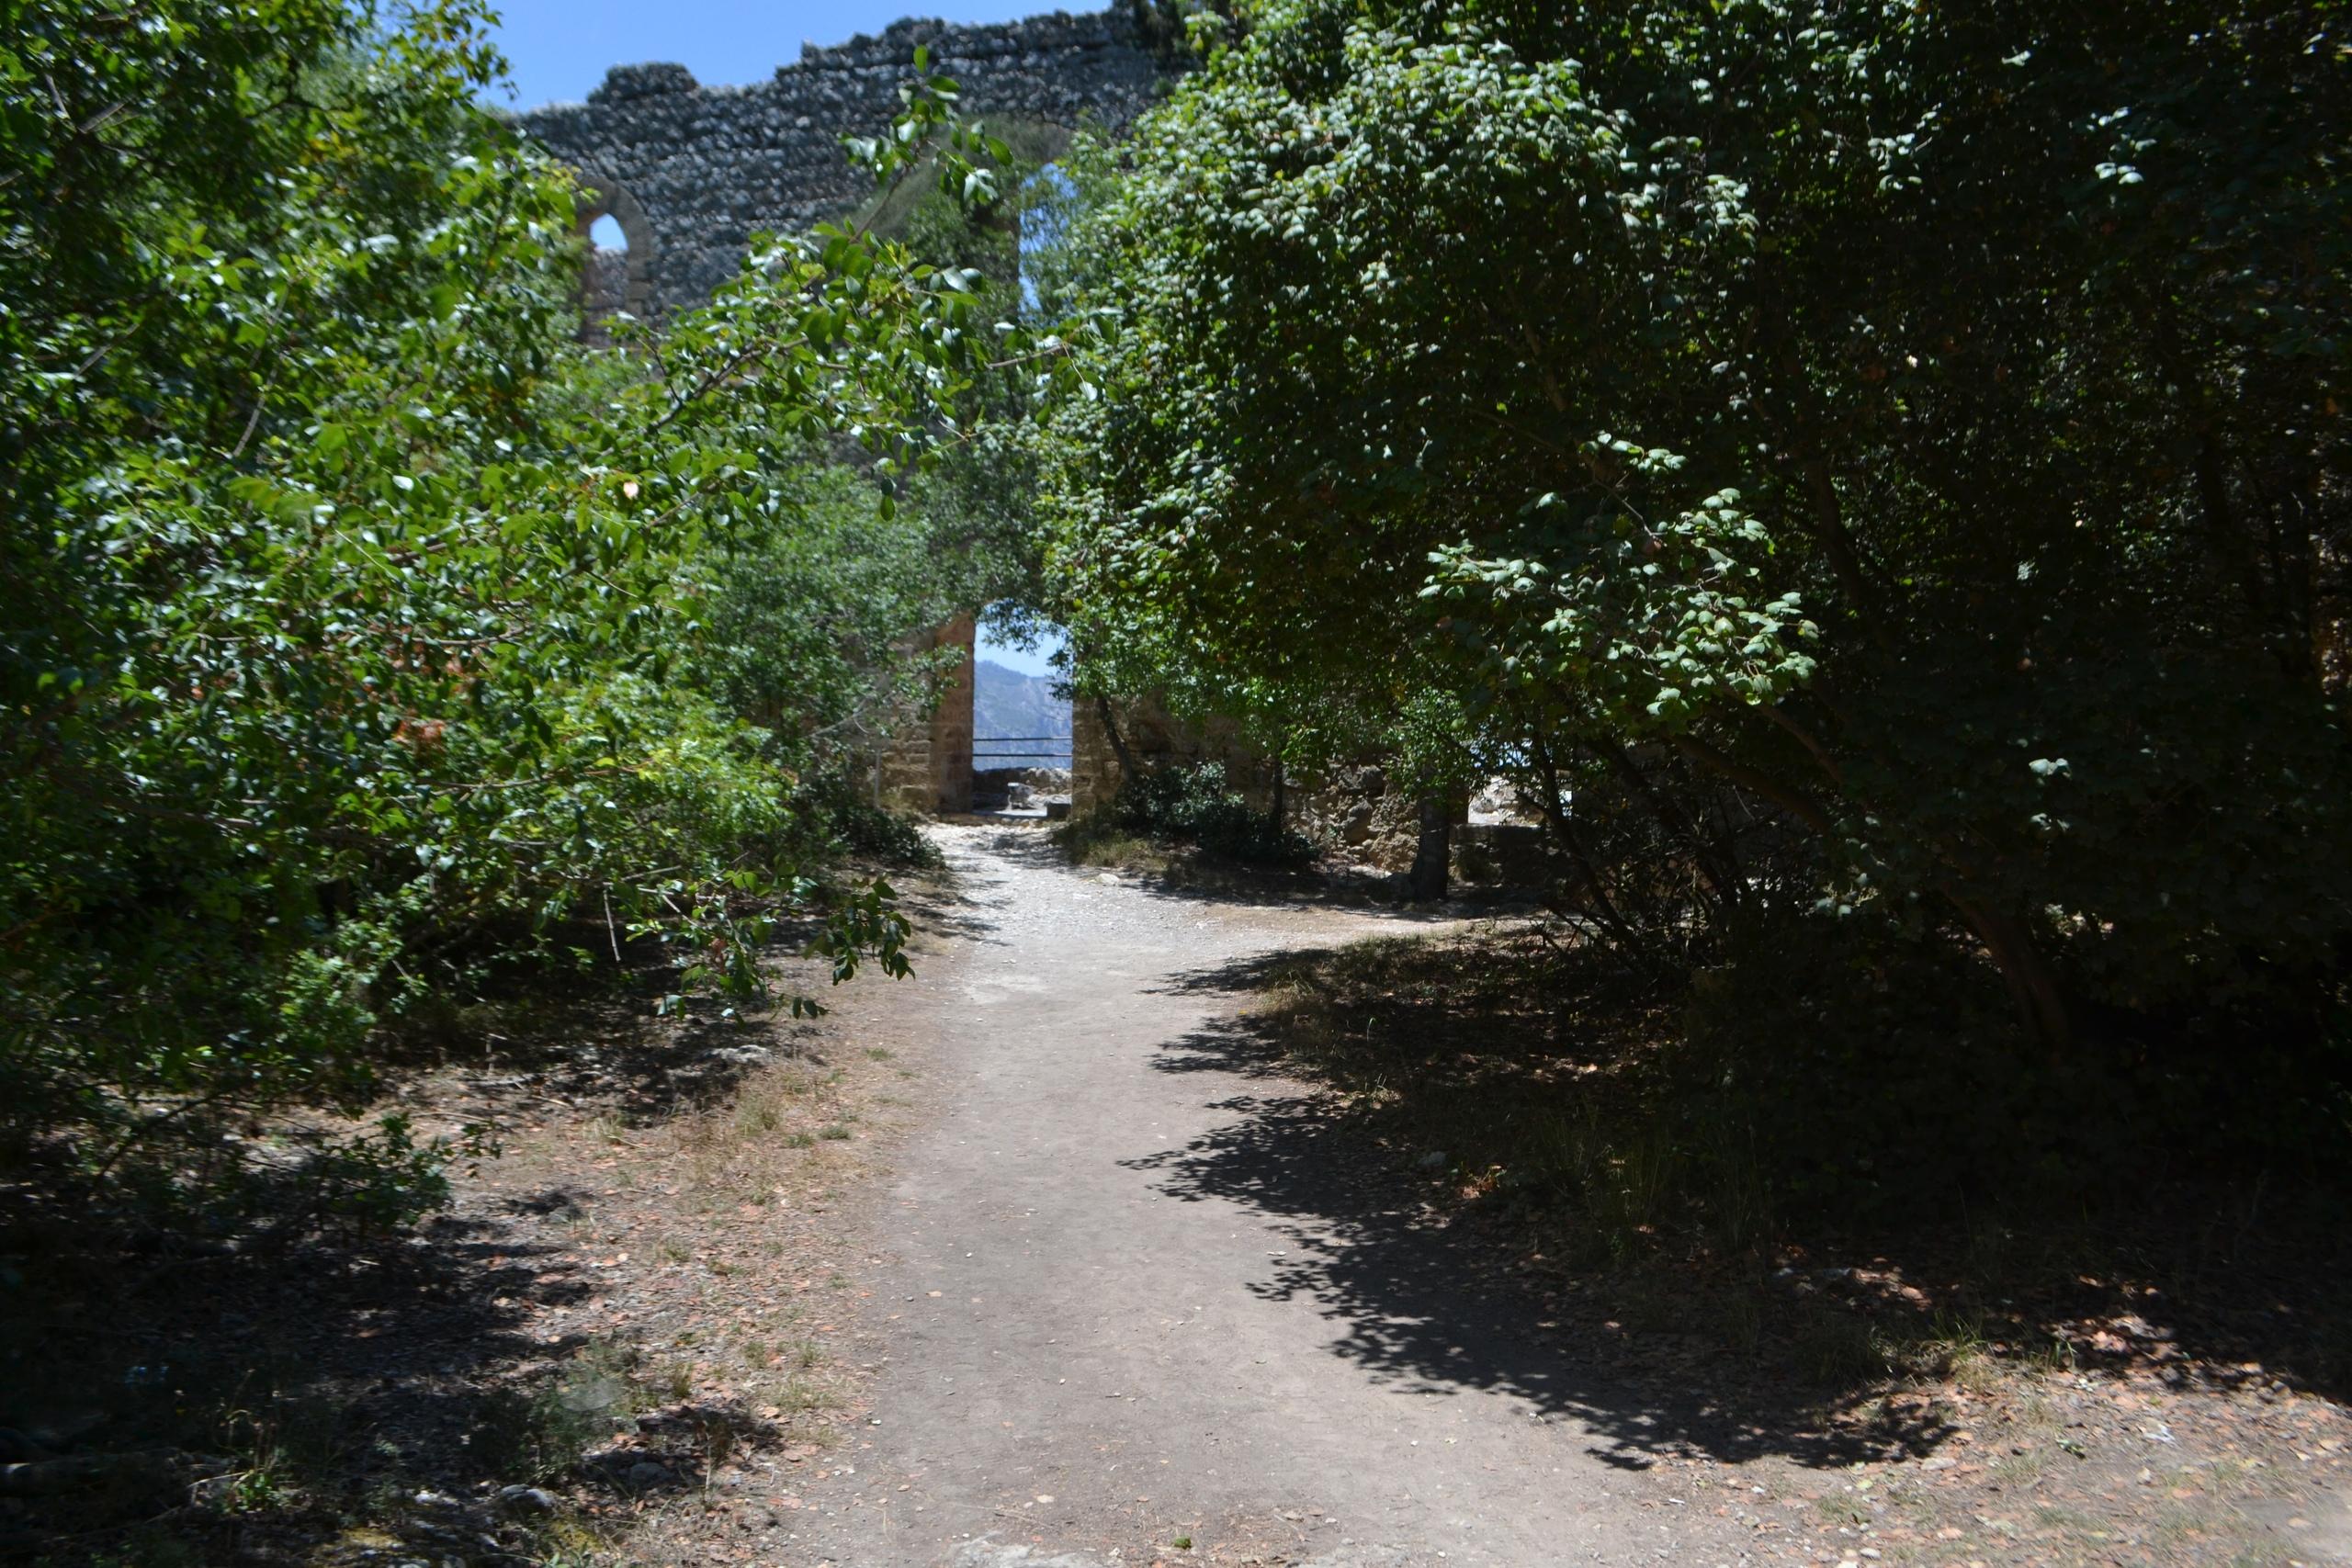 Северный Кипр. Замок Святого Иллариона. (фото). - Страница 3 I9md6P_MM60